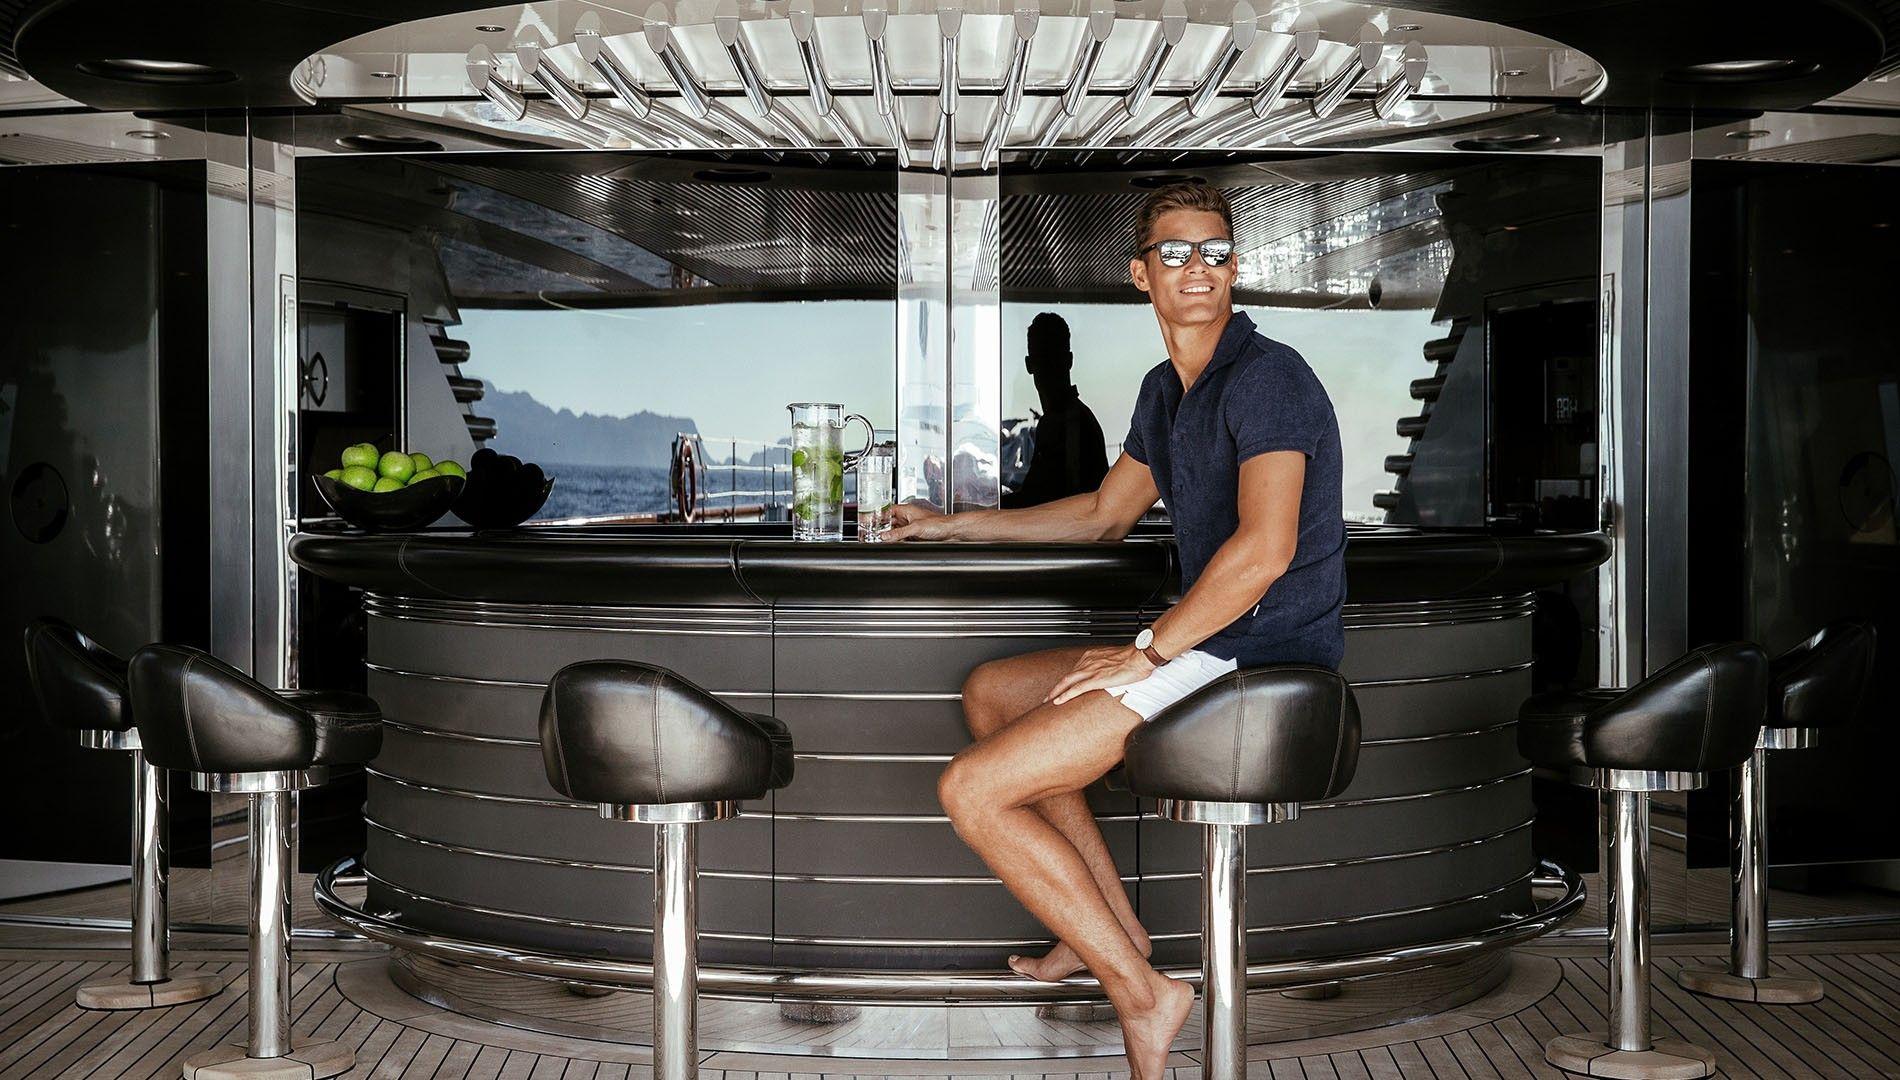 Yacht MALTESE FALCON Yacht, Sailing yacht, Luxury